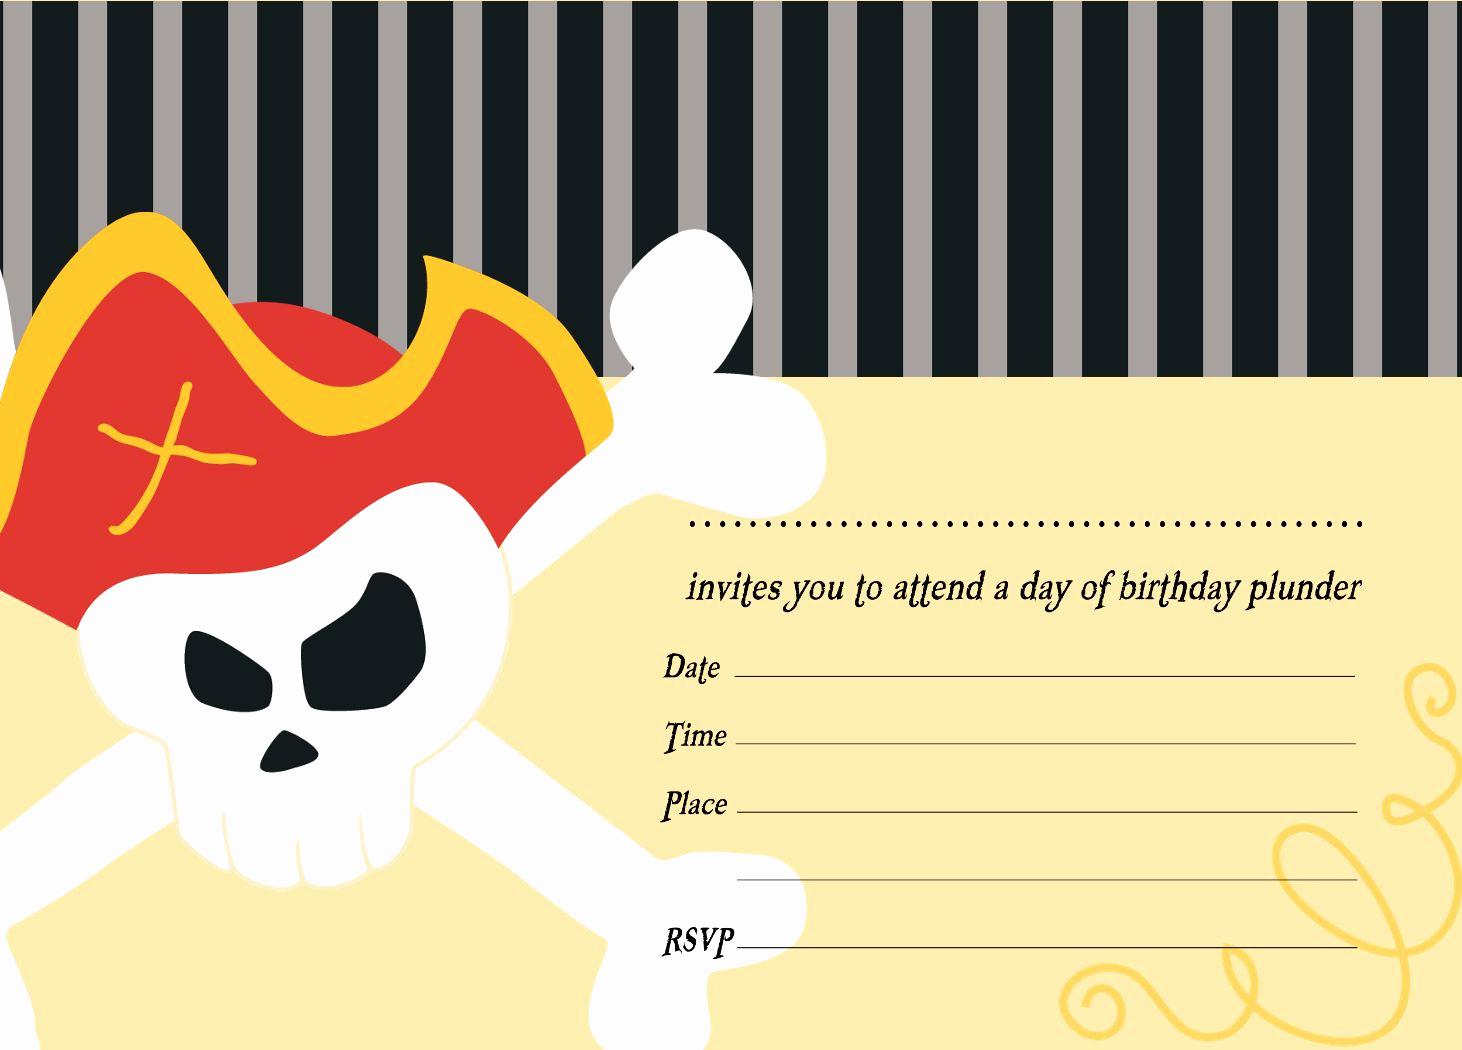 Free Pirate Invitation Template Elegant Pirate Party Invitation Templates